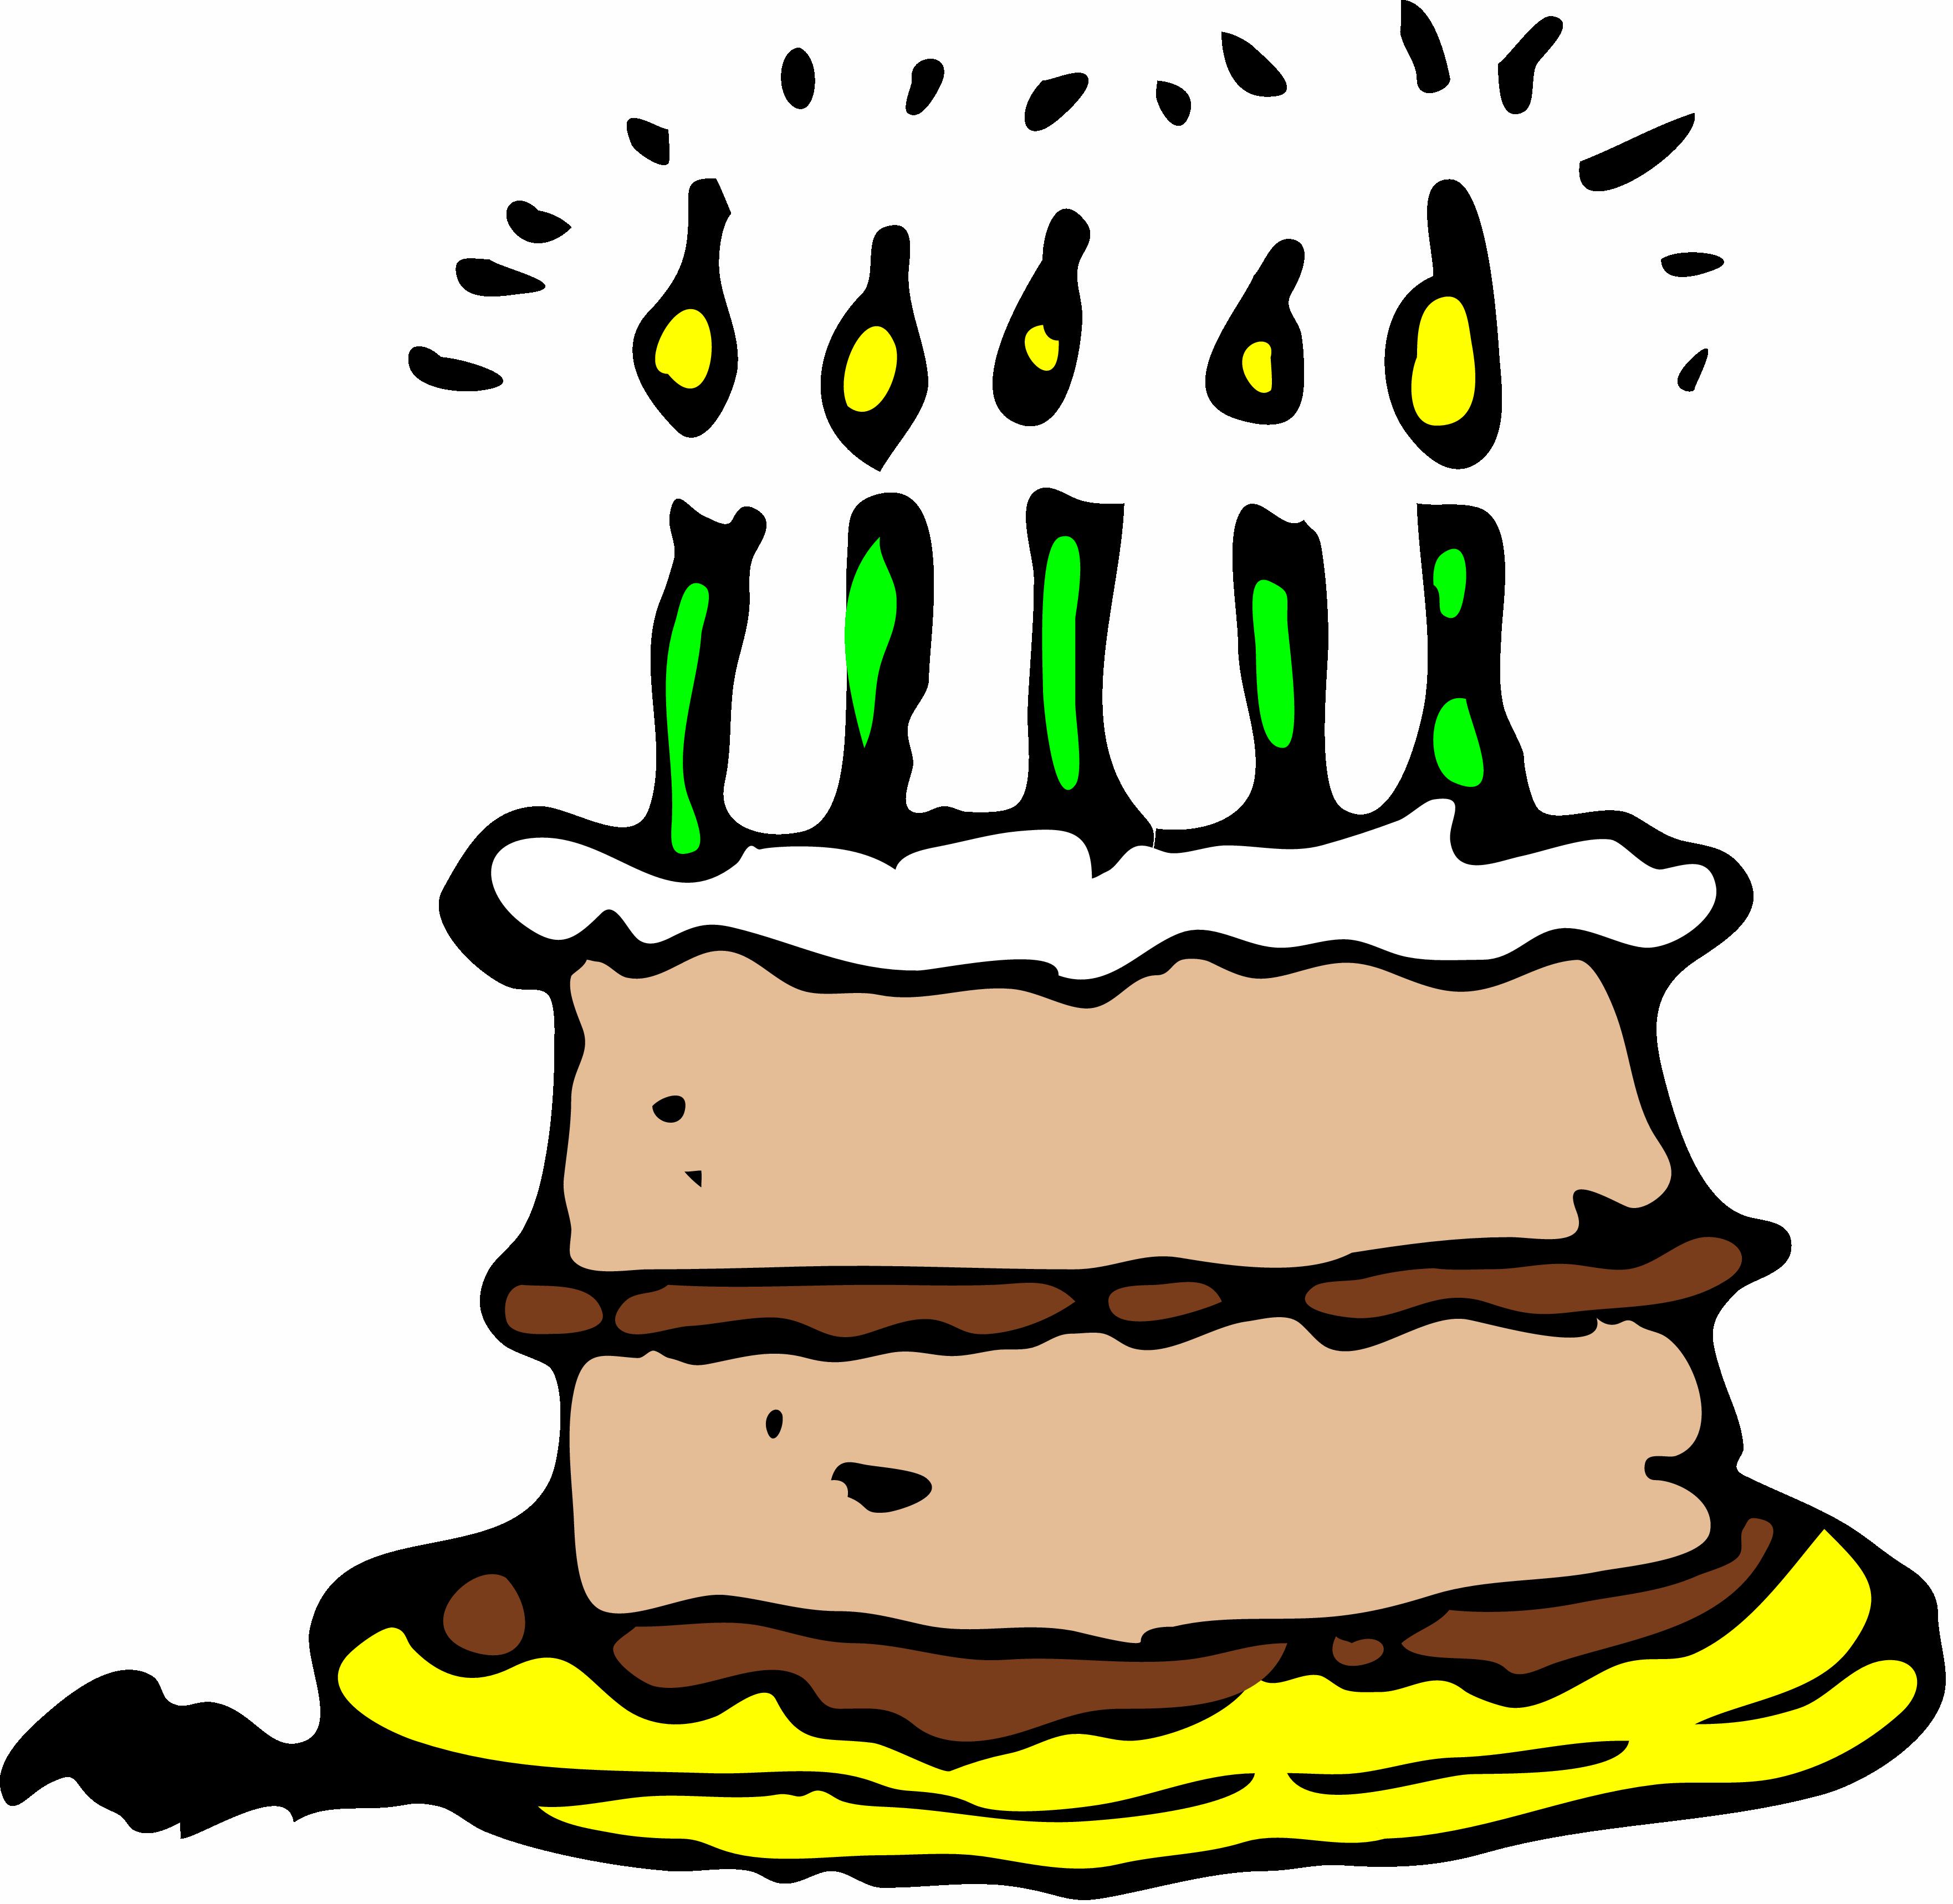 Free Birthday Cake Clip Art - ClipArt Best